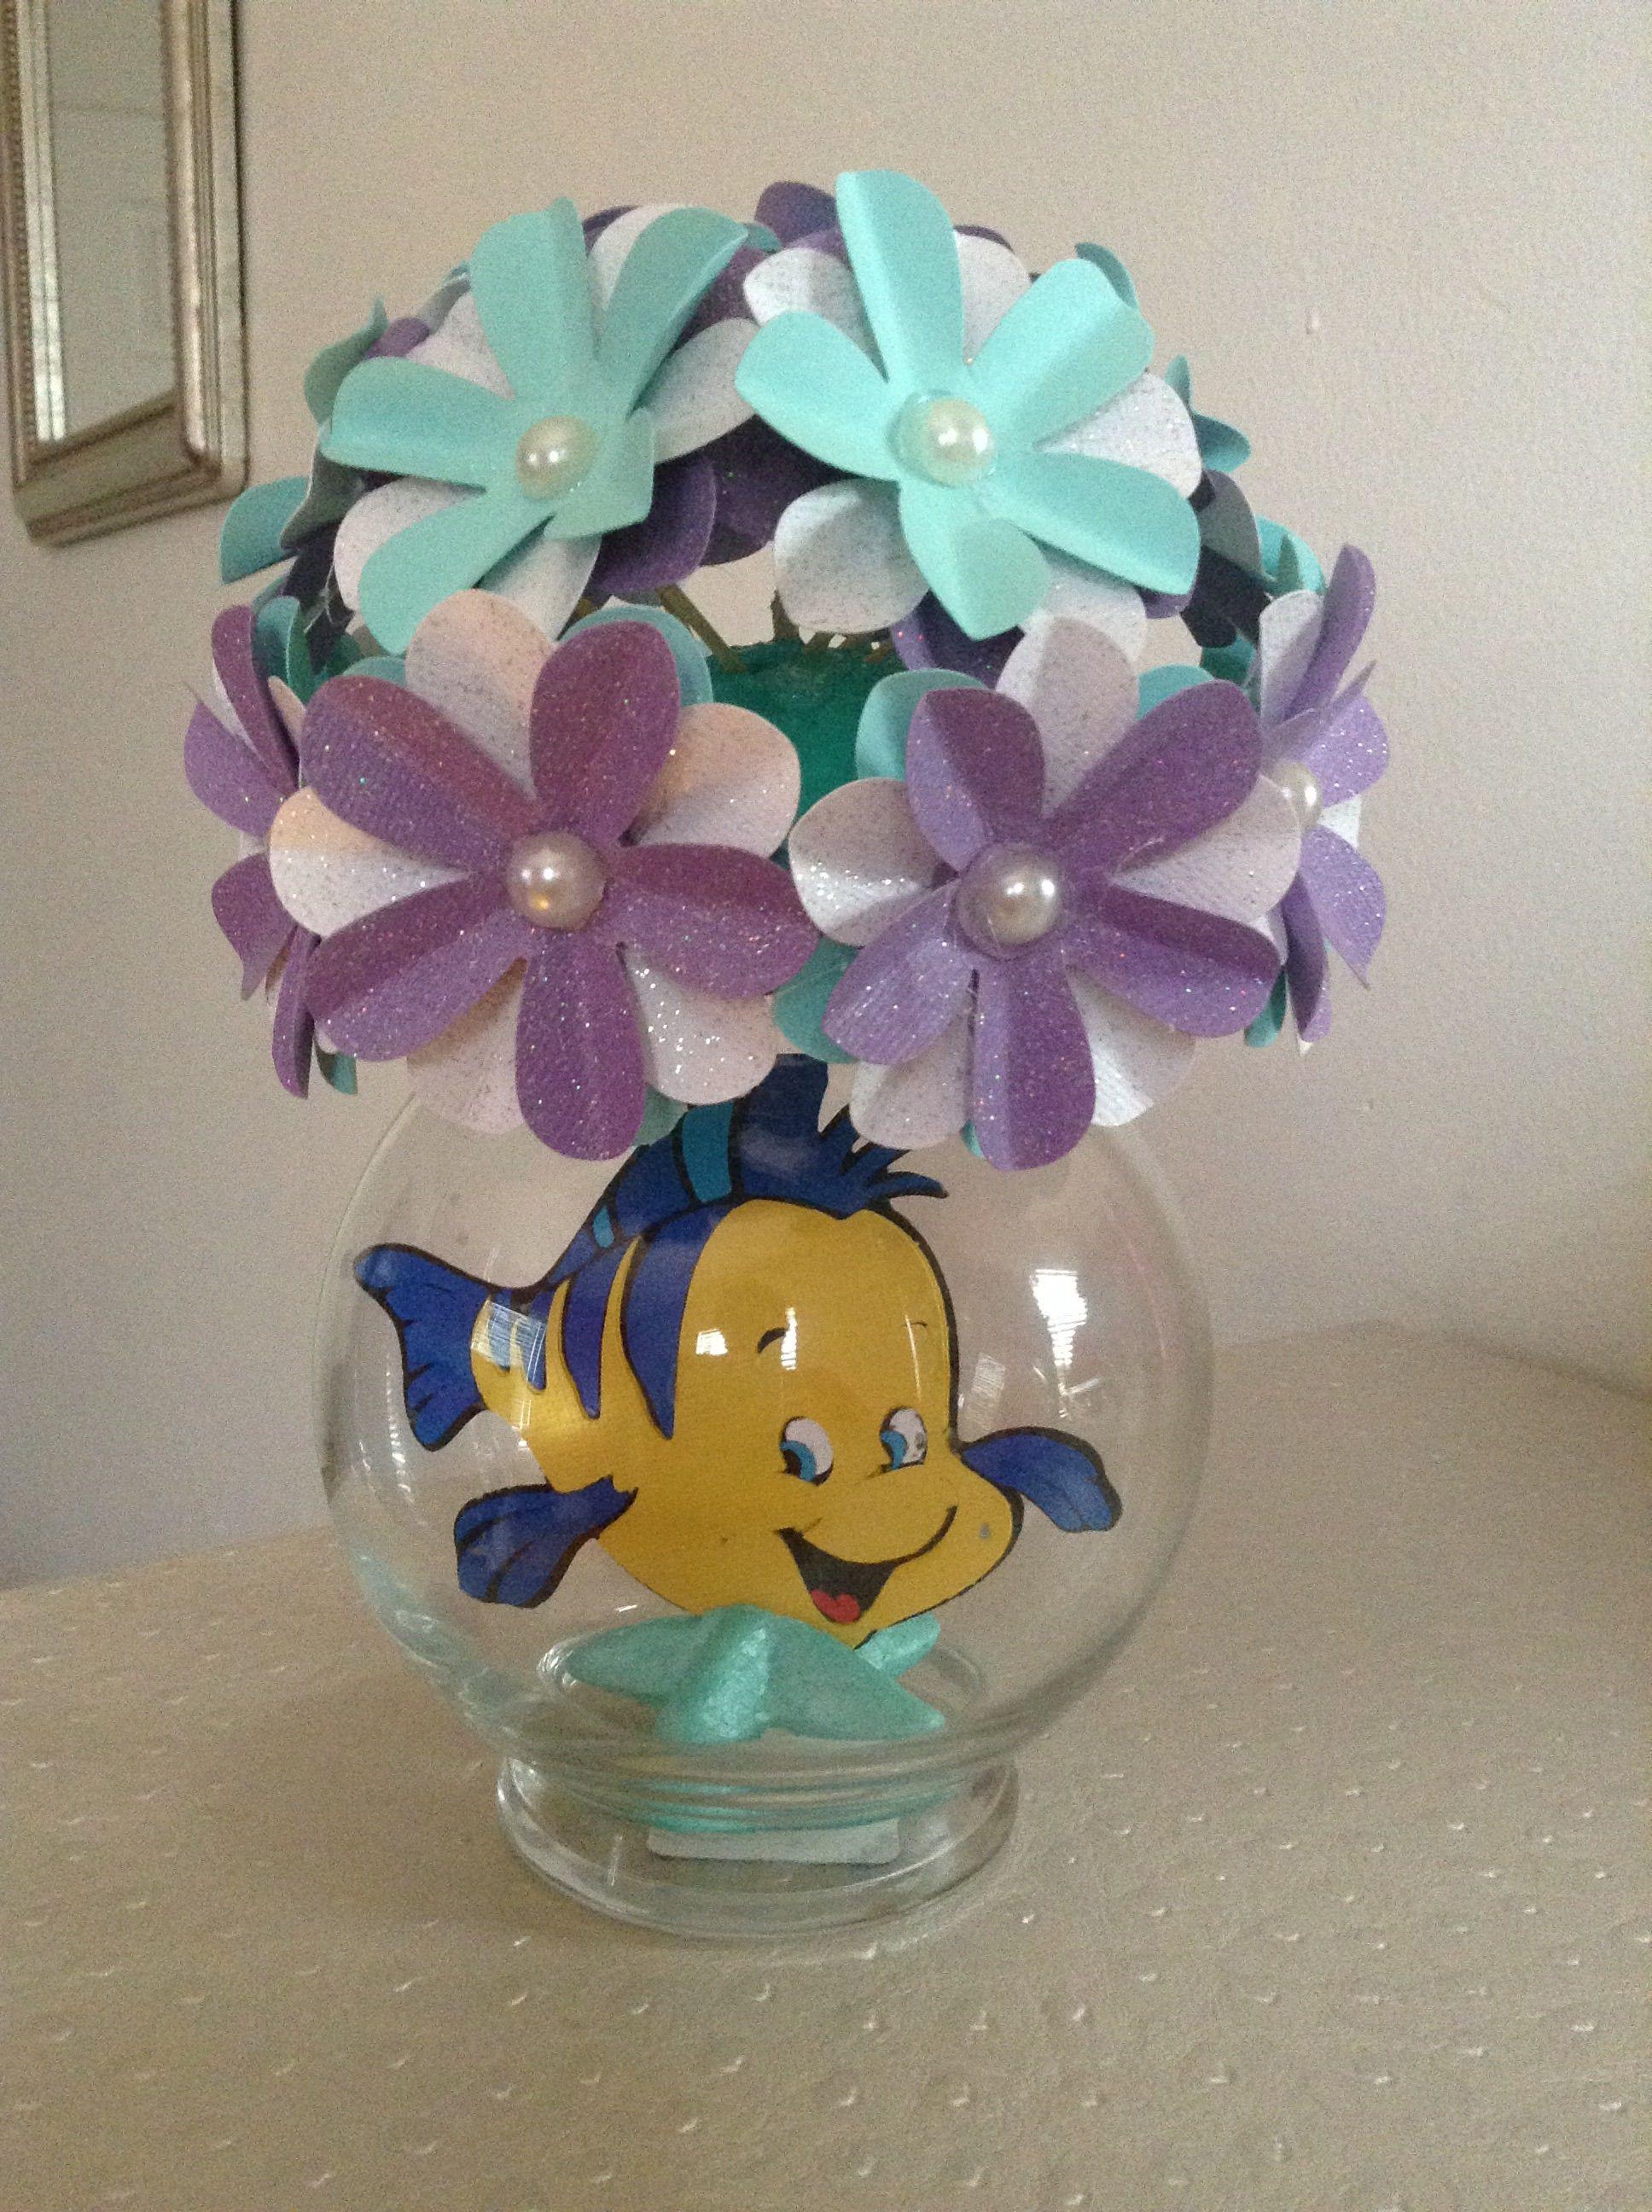 Little Mermaid Party Centerpiece Ideas  Little Mermaid Flounder Party Centerpiece